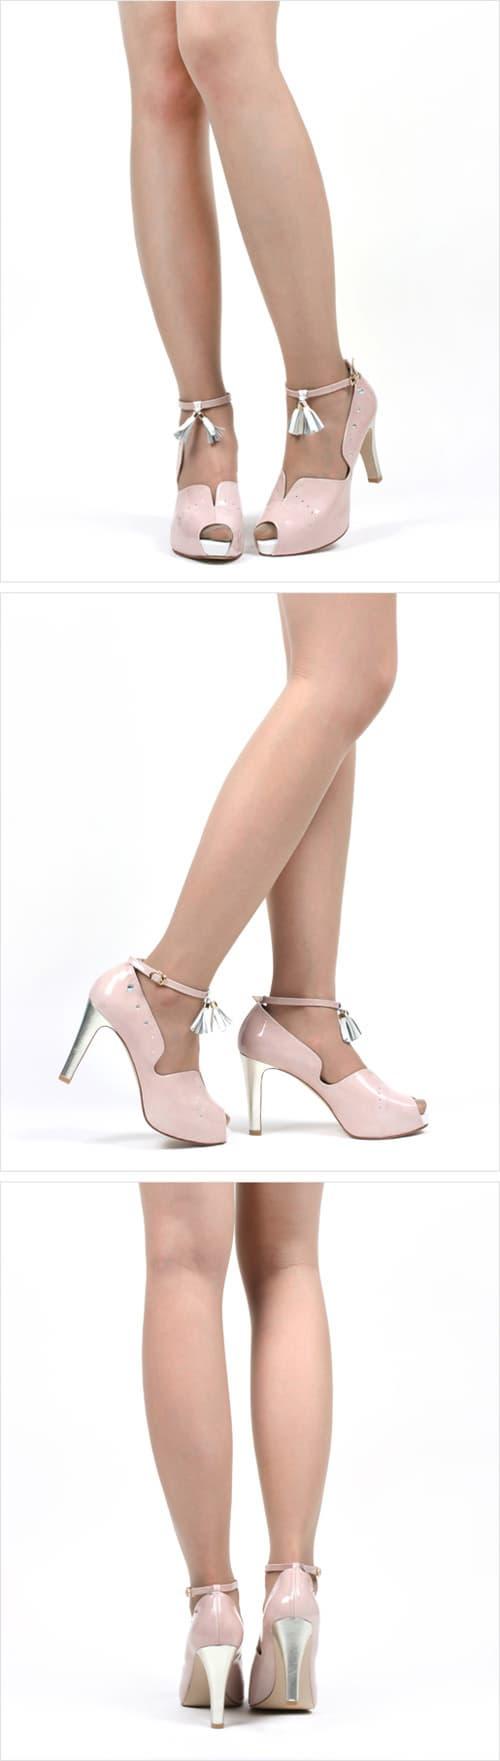 morpho_pink_fit.jpg